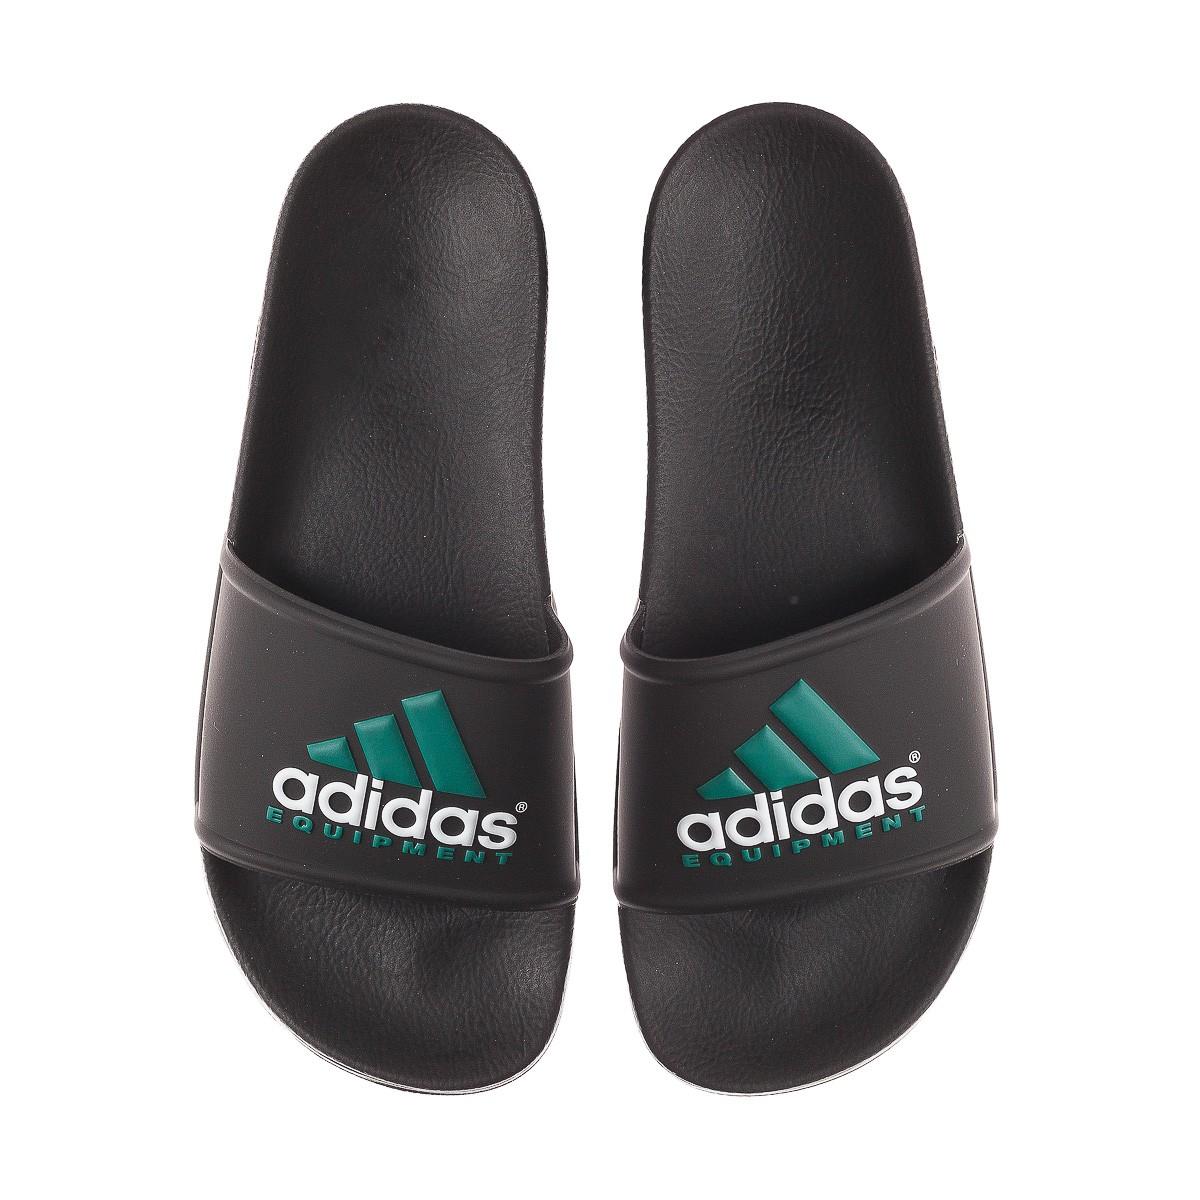 1bbdd4ca6 Lyst - adidas Originals Adilette Equipment Slides in Black for Men